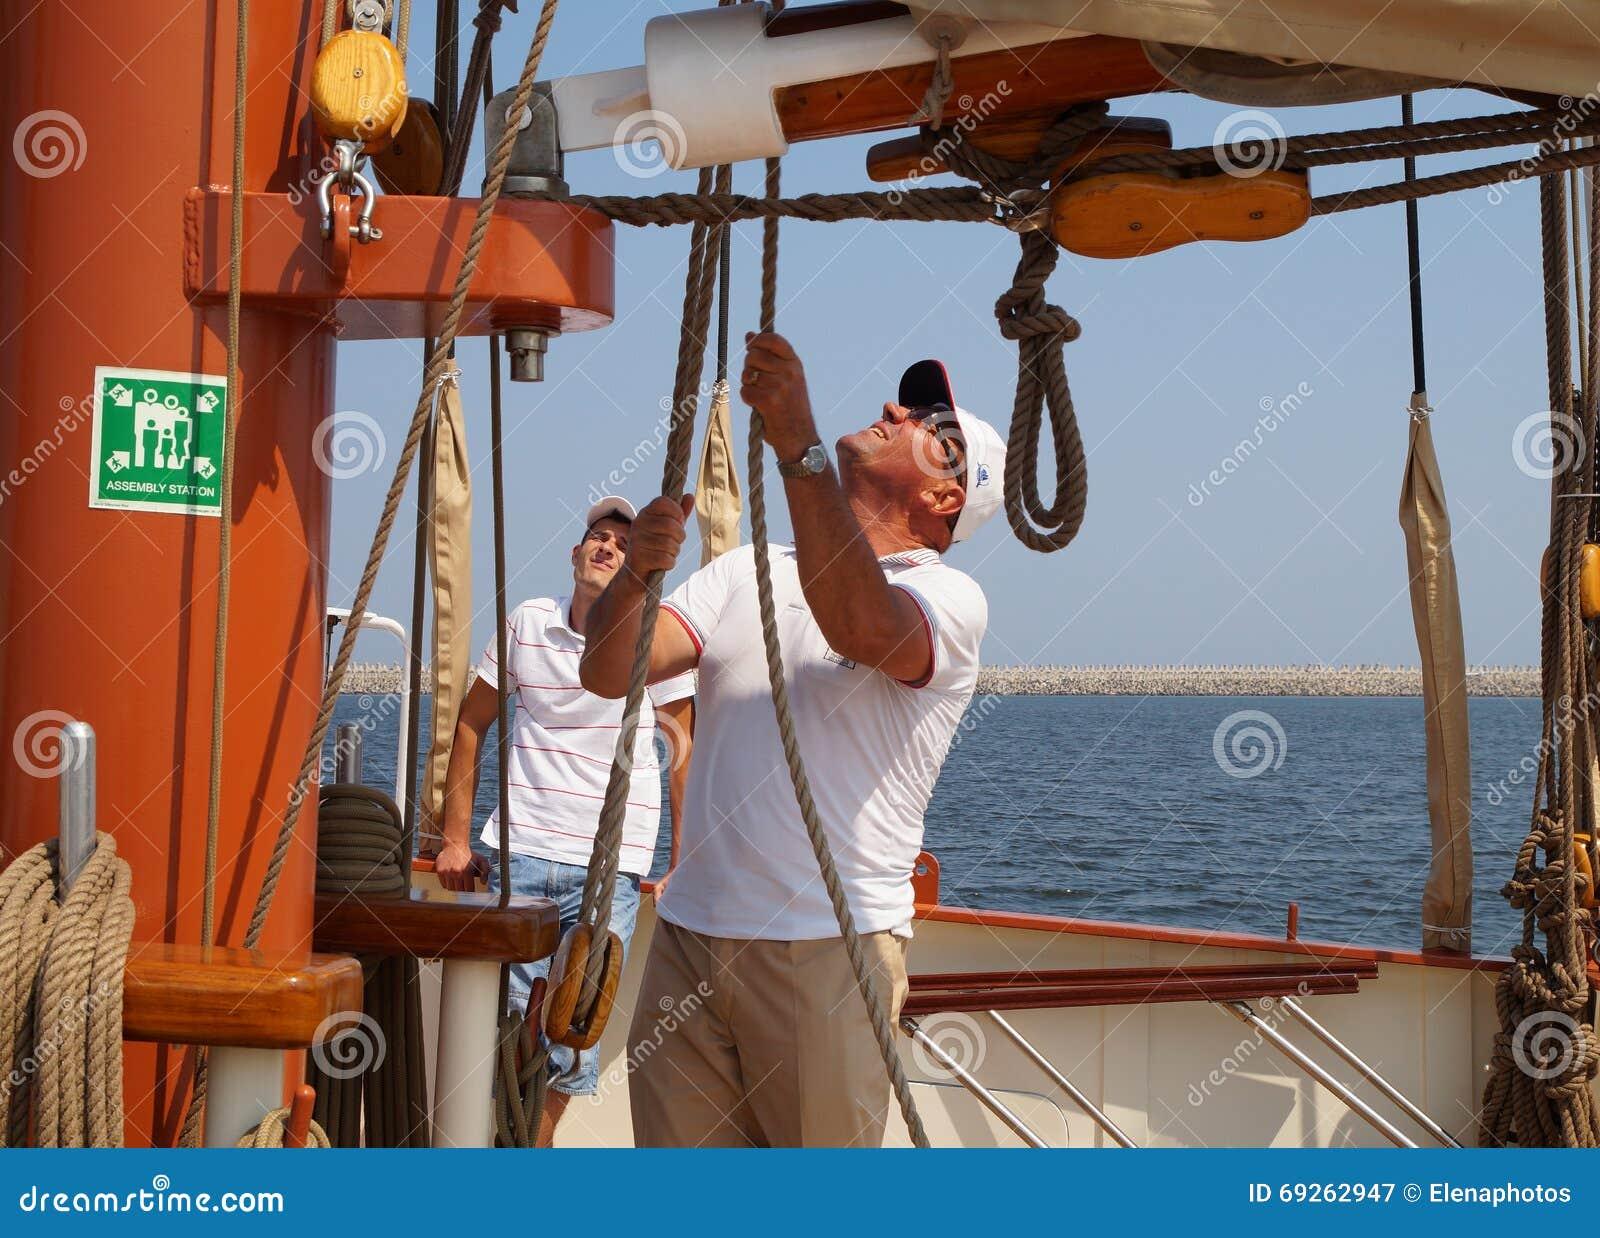 sea adventure sailing vessel adornate constanta. Black Bedroom Furniture Sets. Home Design Ideas